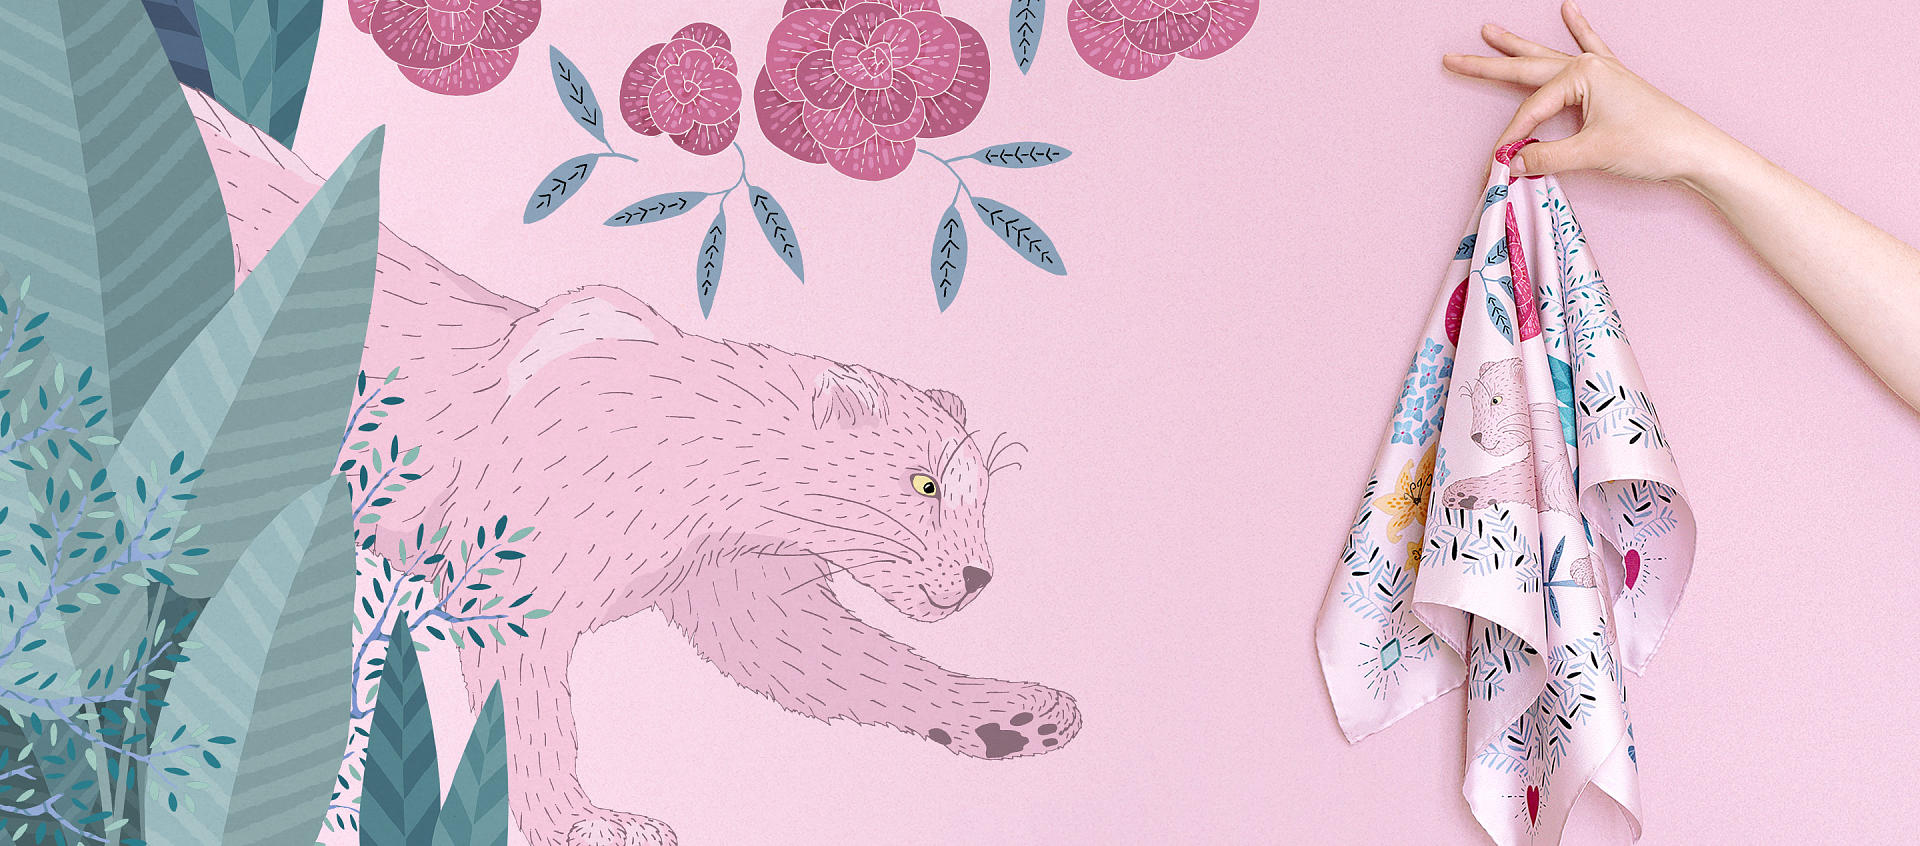 le-chale-bleu-HOMEPAGE-pink-panther-silk-bandana-drawing-v2